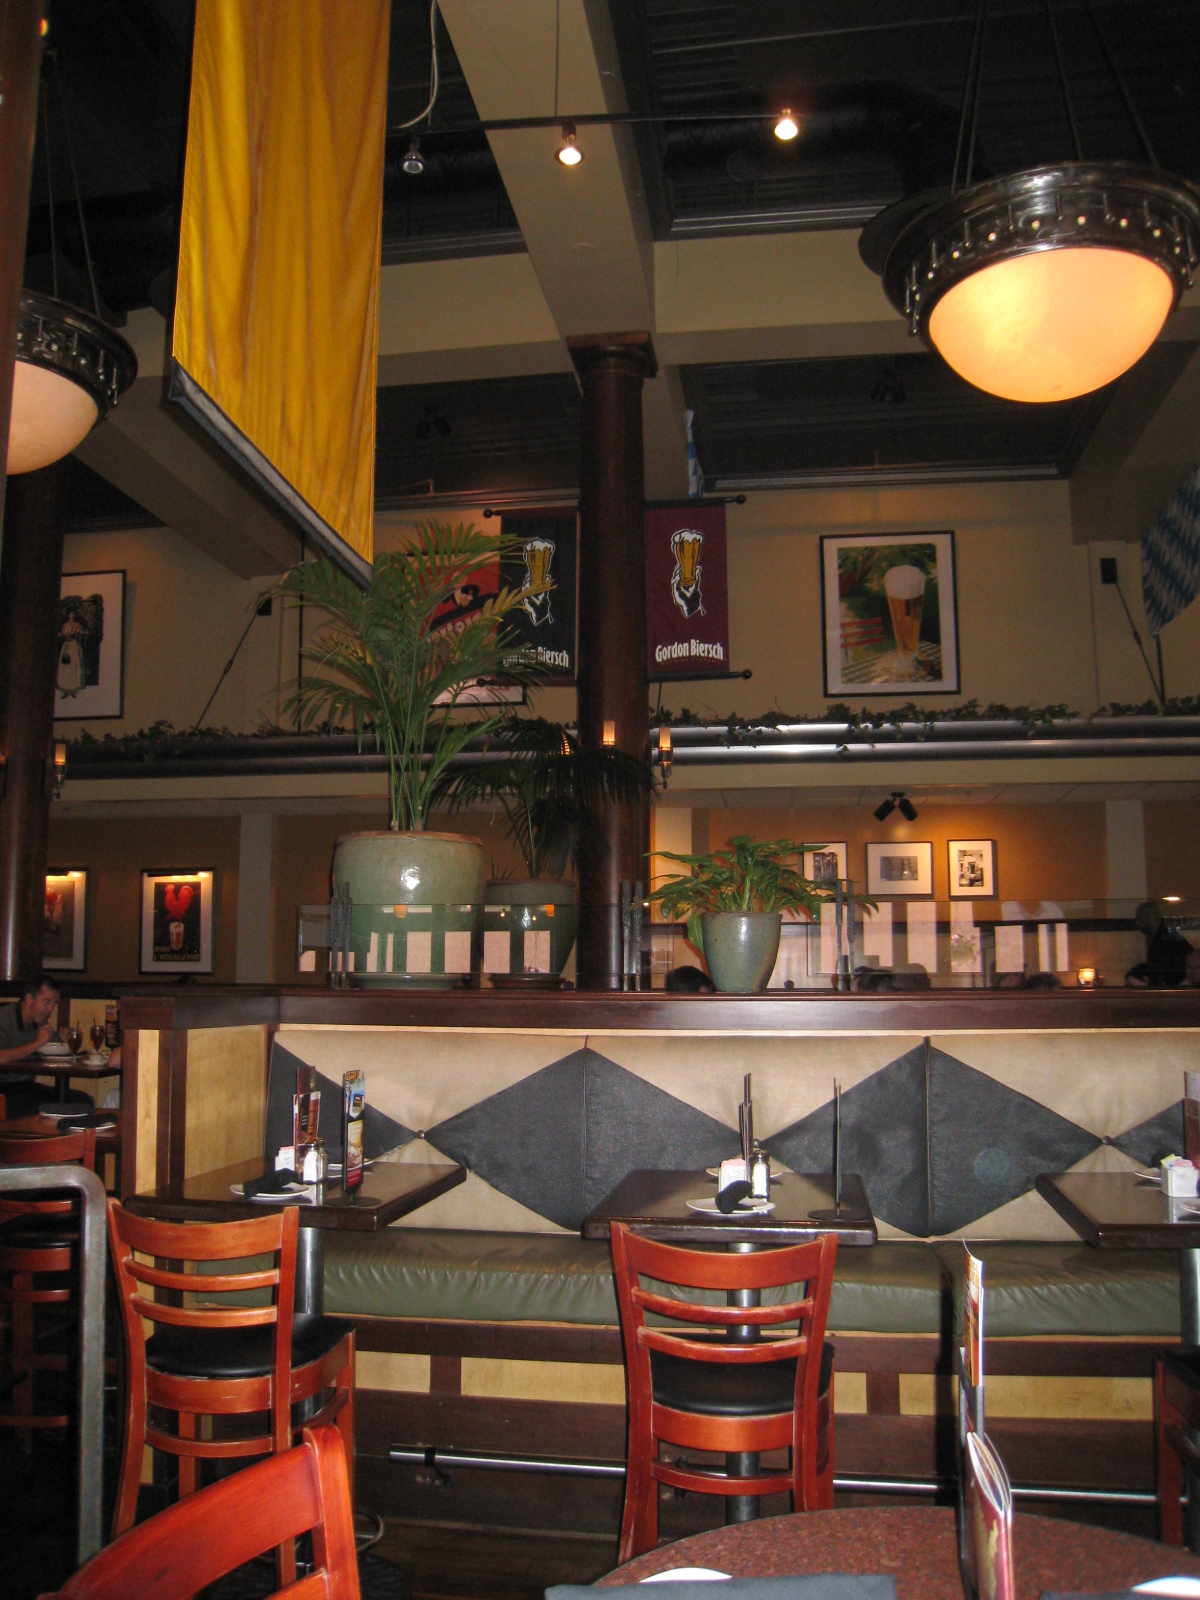 Gordon Biersch Midtown Closing In November - Training table restaurant closing